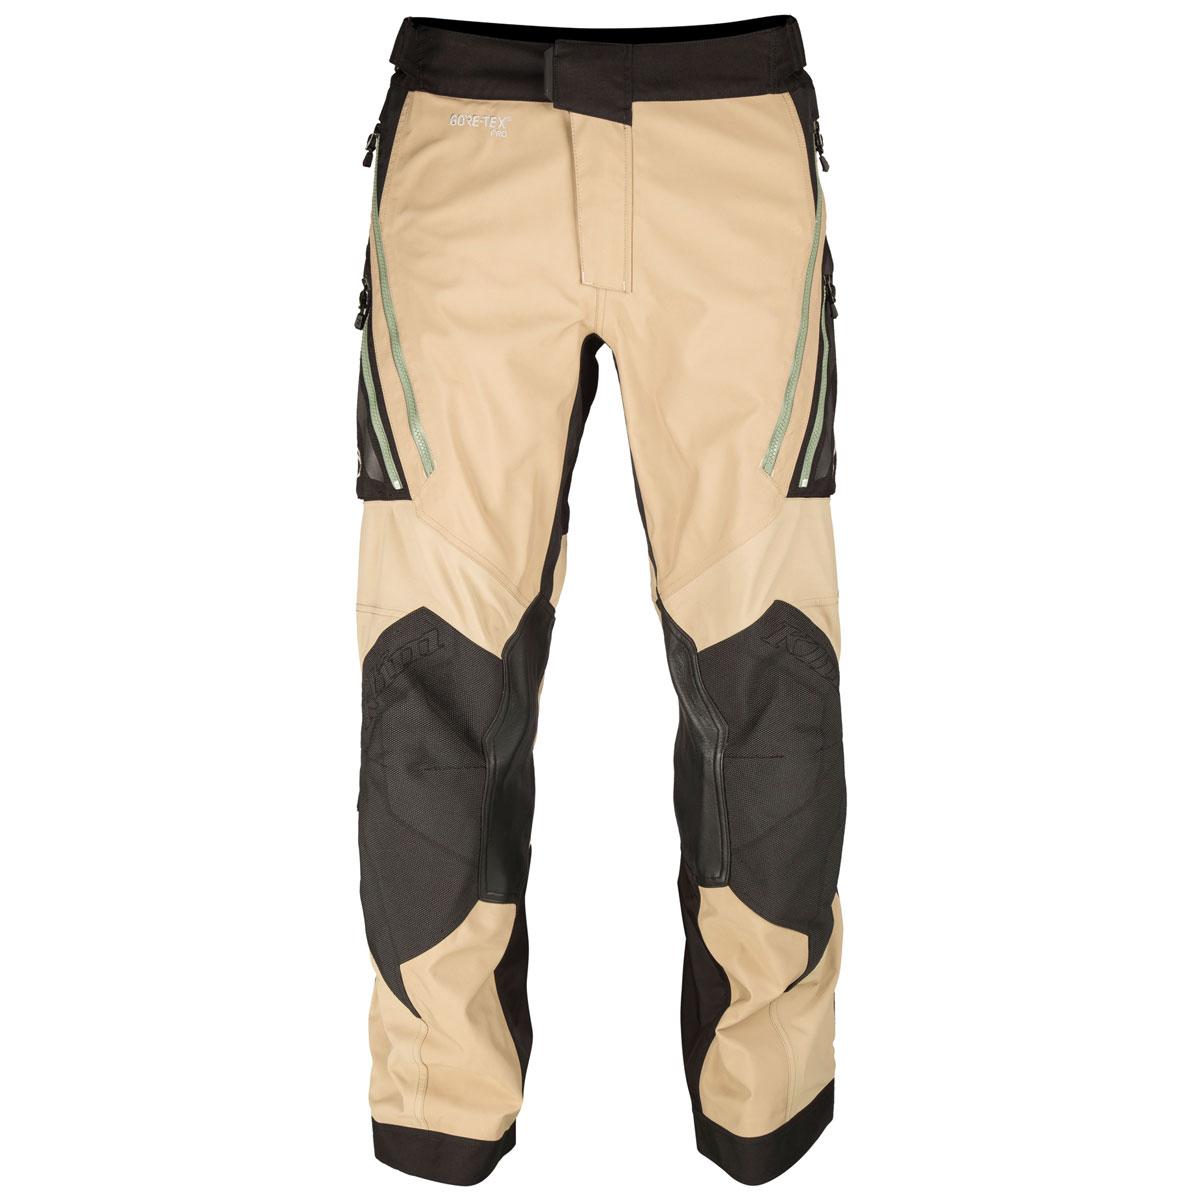 Klim Men's Badlands Pro Tan Pants